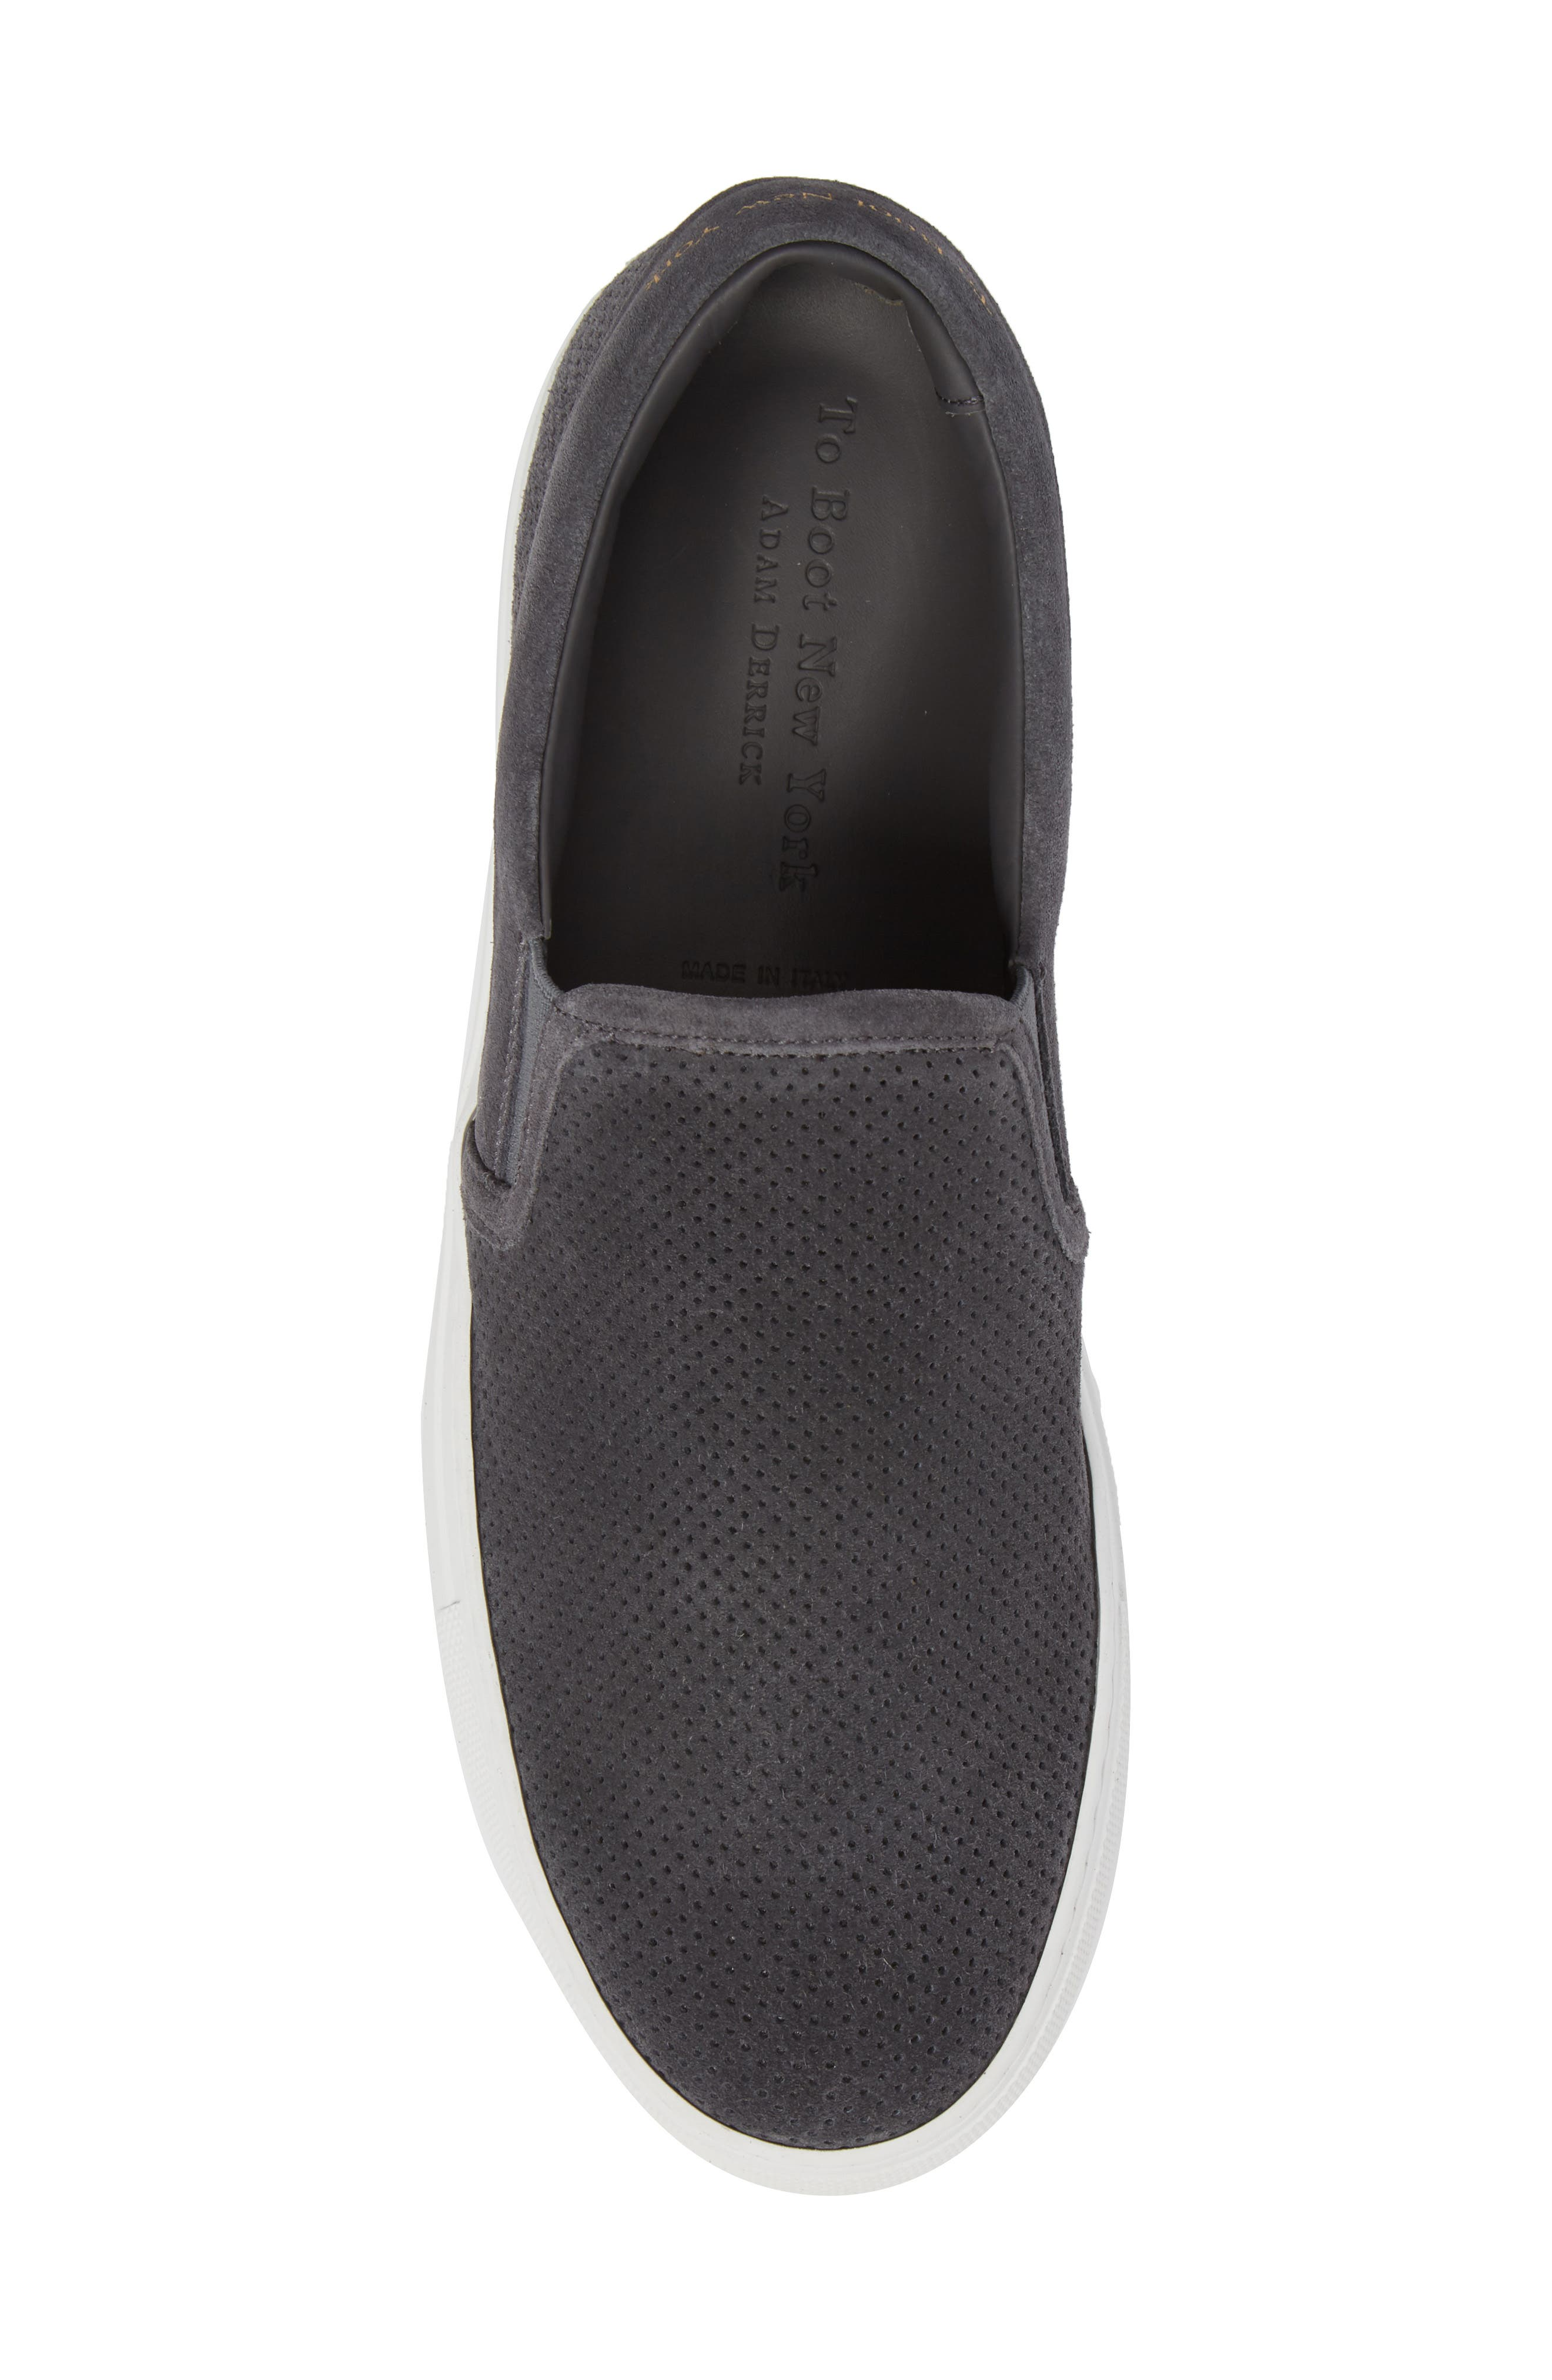 Buelton Perforated Slip-On Sneaker,                             Alternate thumbnail 5, color,                             Avion/ Tan Suede